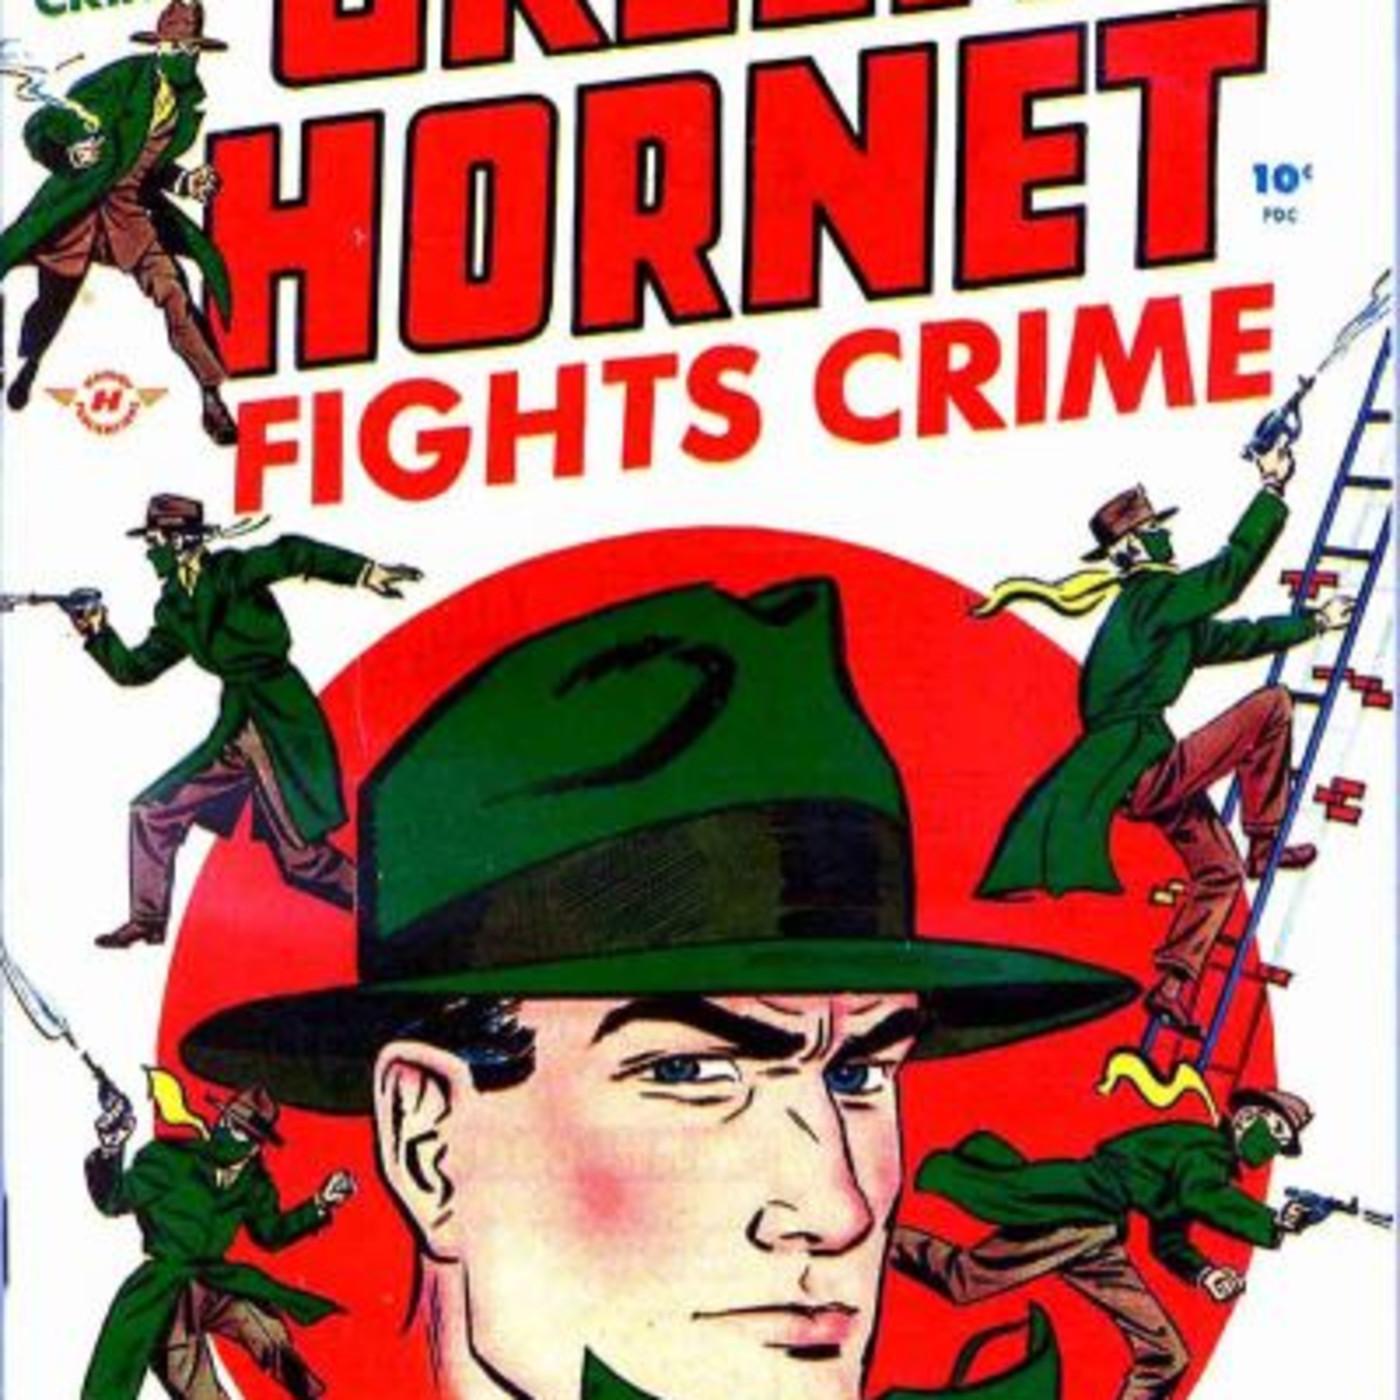 The Green Hornet - 00 - 451225 Boathouse Mystery.mp3